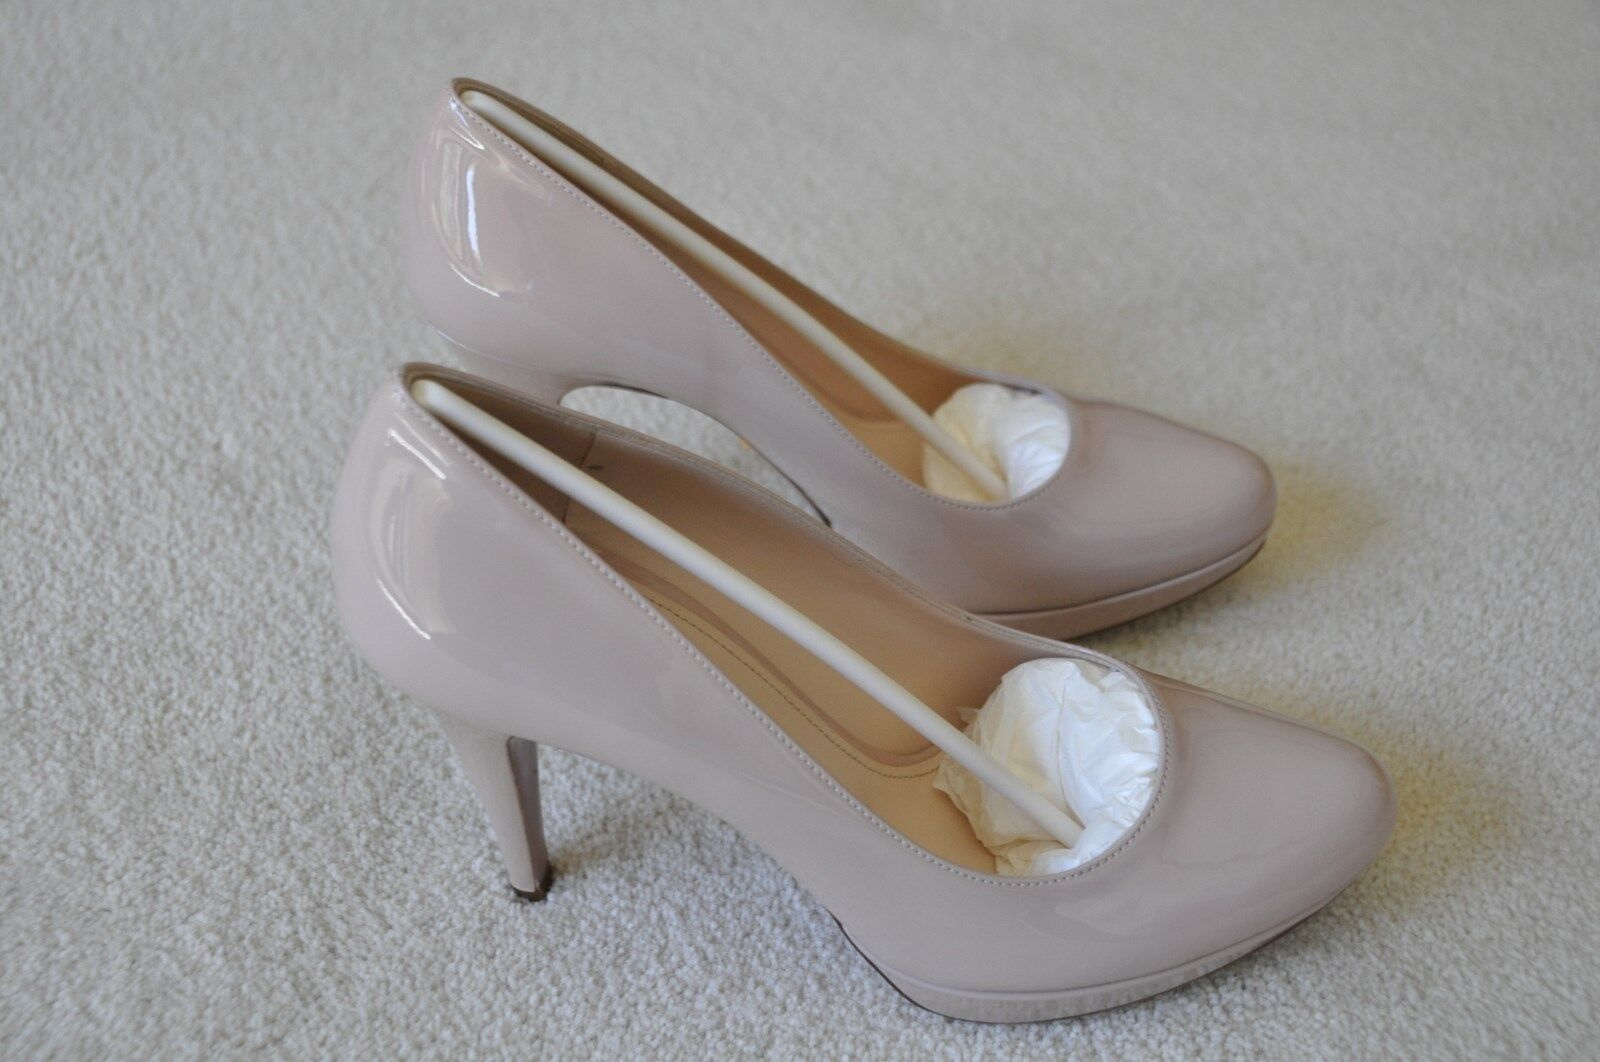 Prada Vernice Basic Cipria (nude pink) pumps size 38.5 (US 8.5)